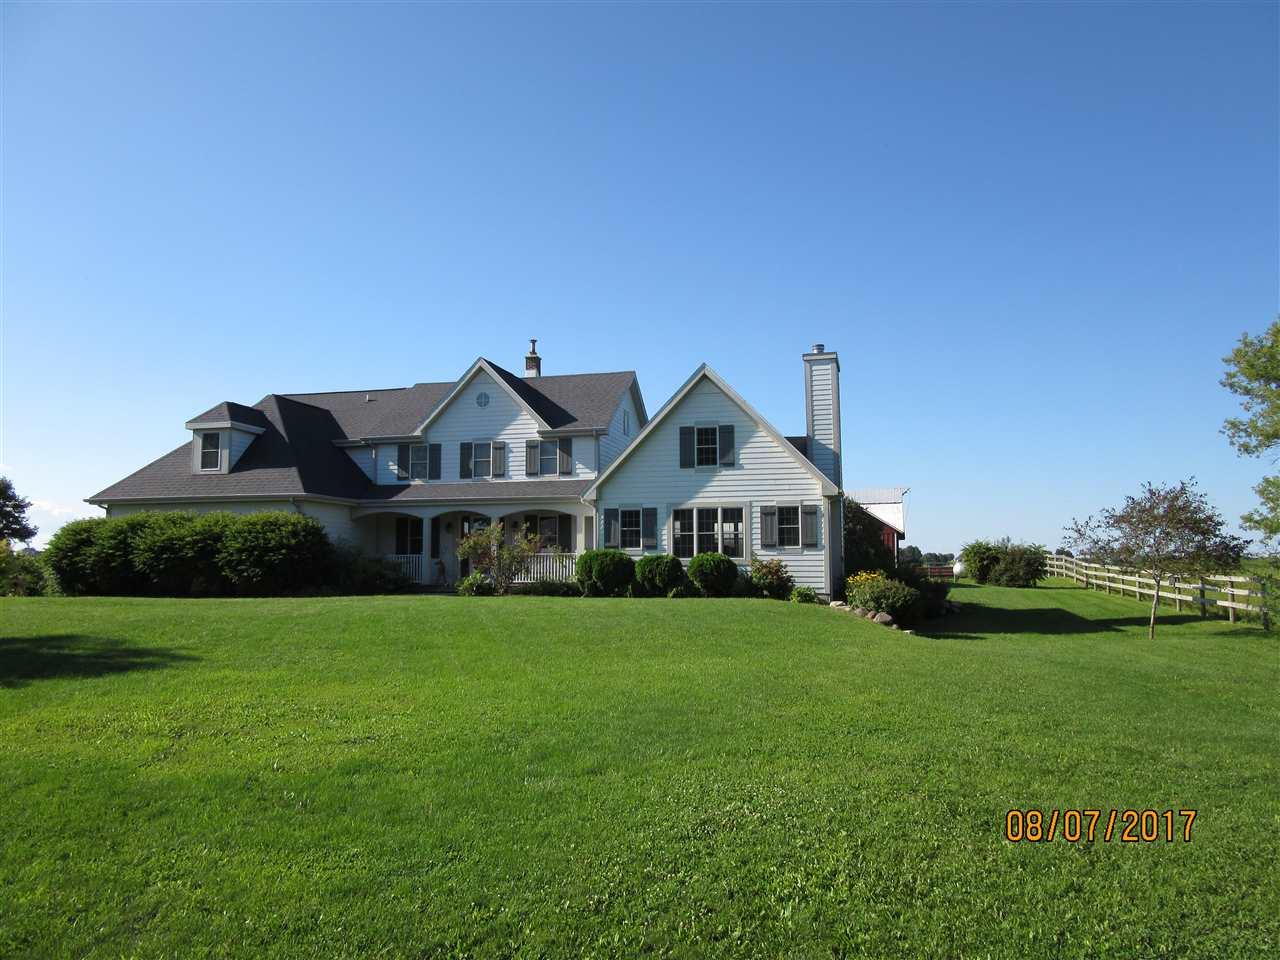 11202 W Gibbs Lake Rd, Porter, WI 53536